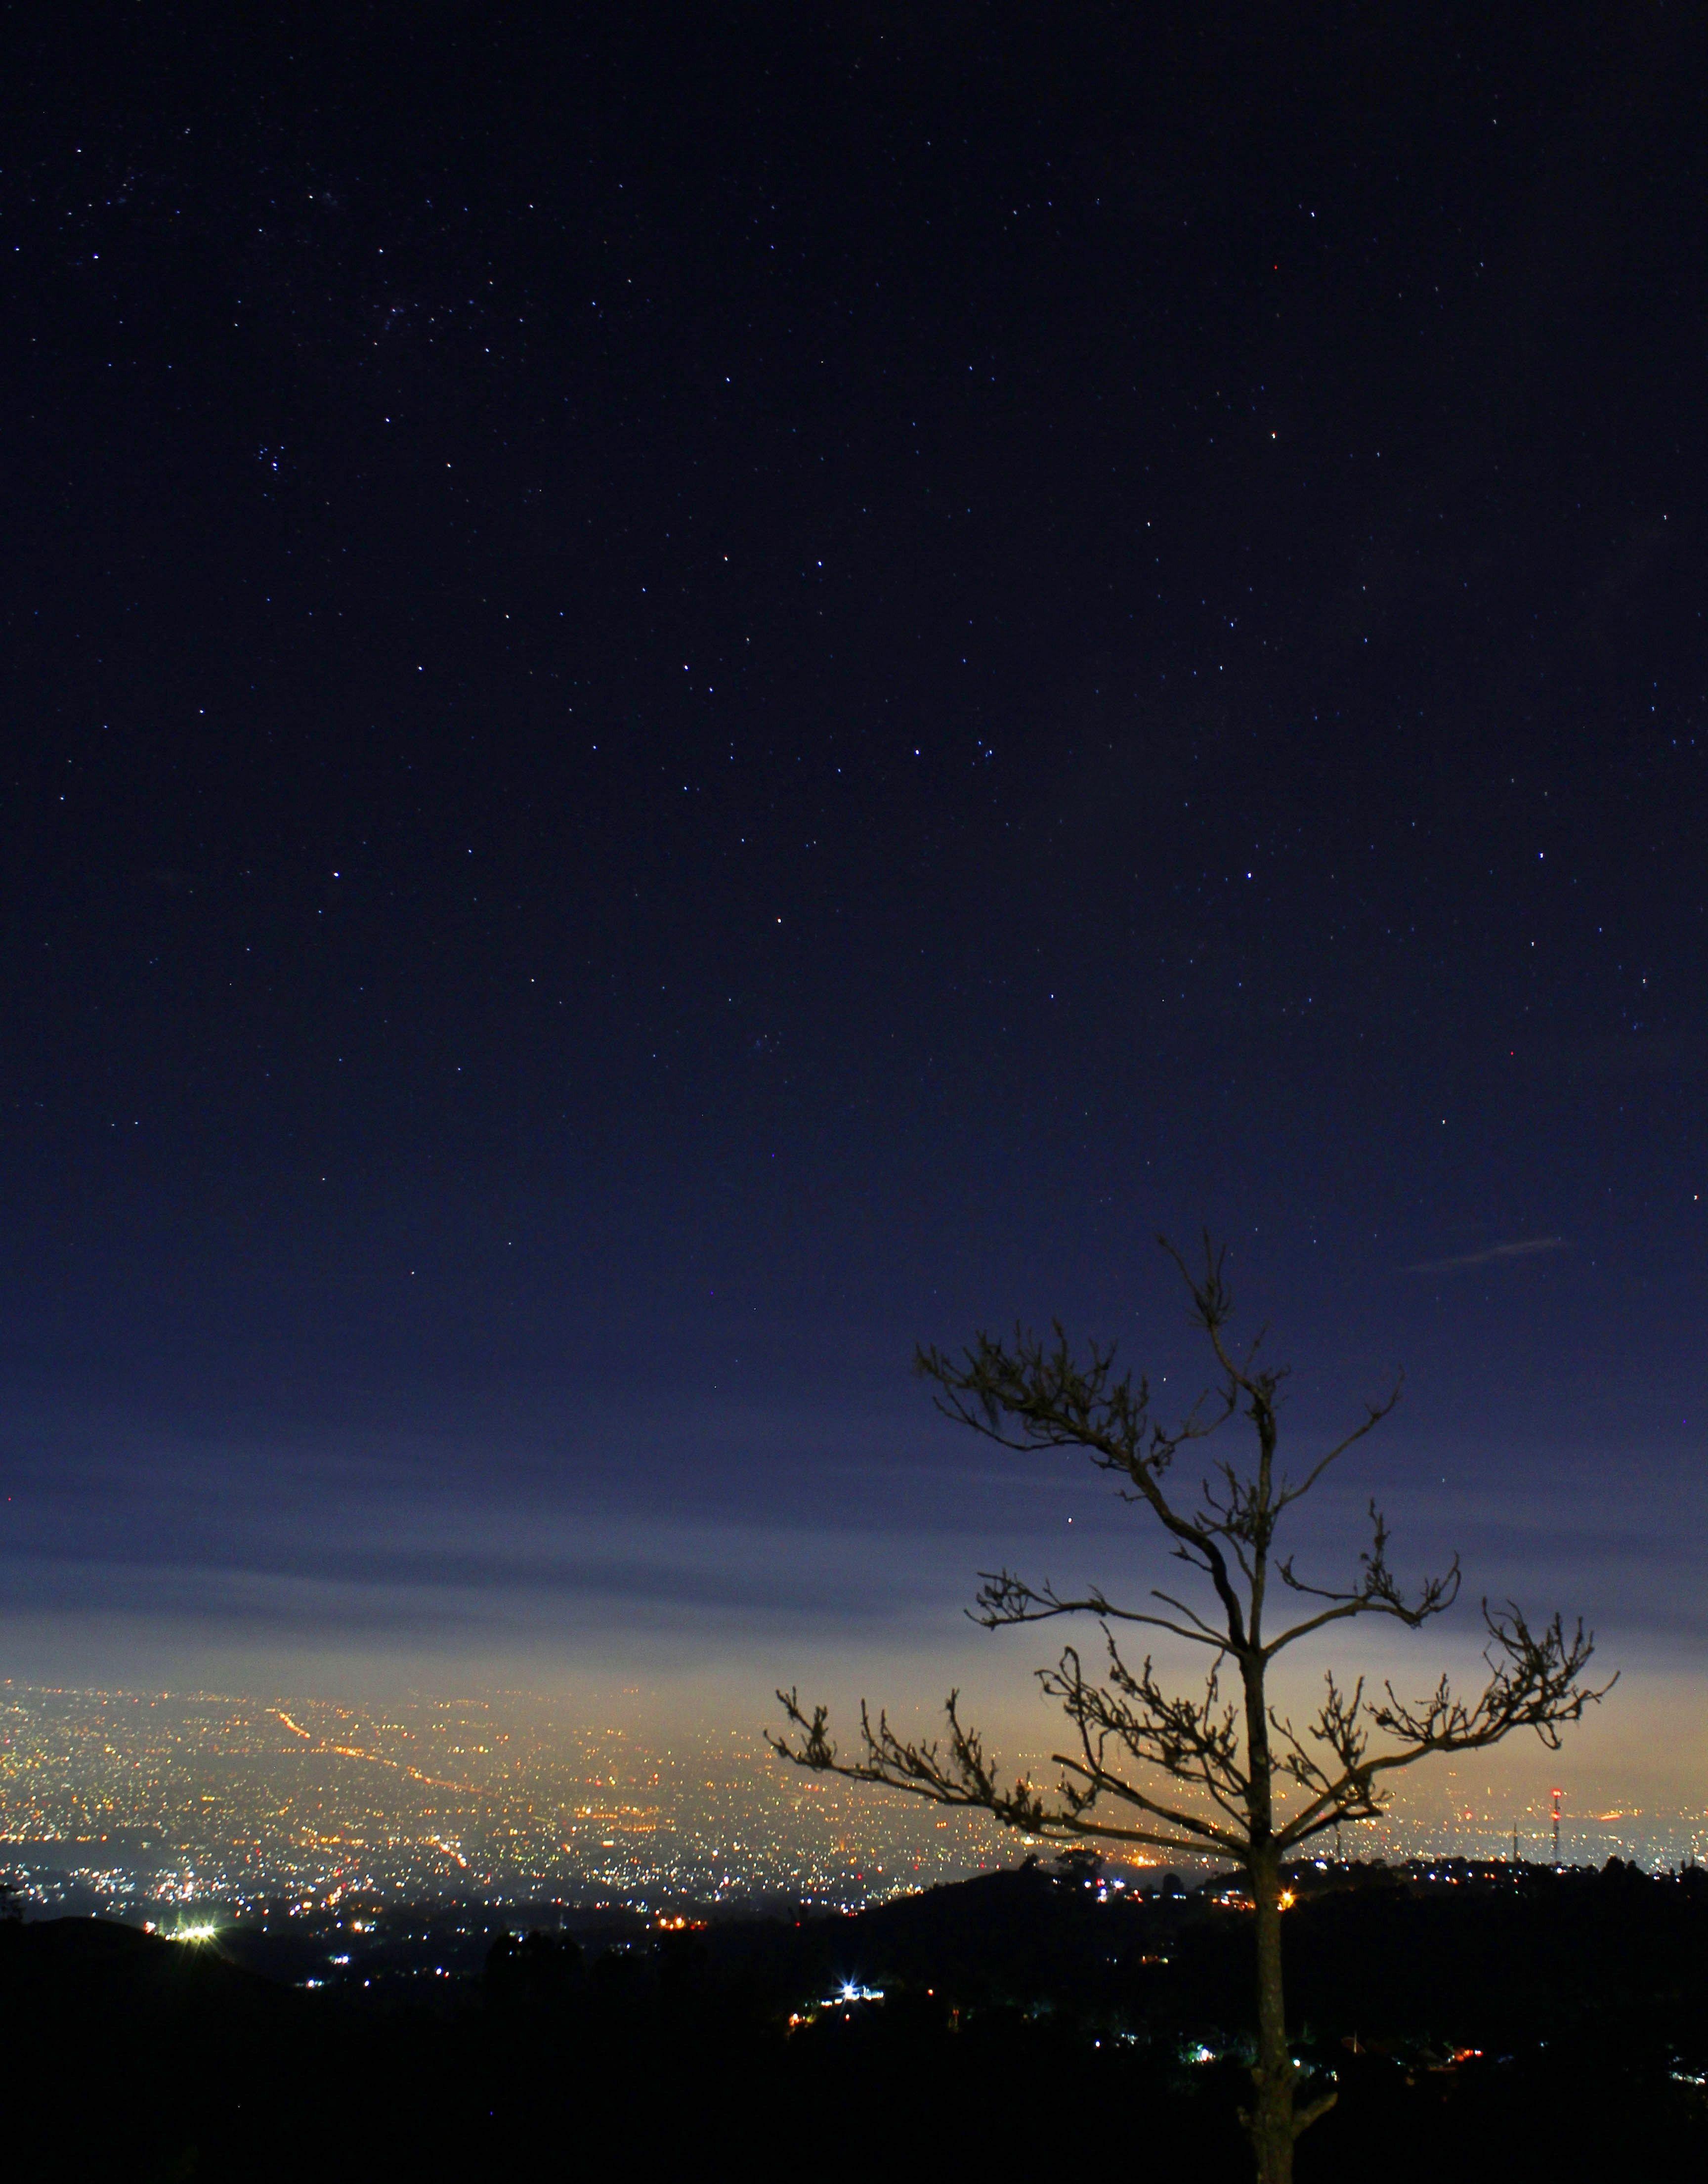 Bandung Night View Taken From Bukit Moko Bandung West Java Indonesia Pemandangan Latar Belakang Foto Alam